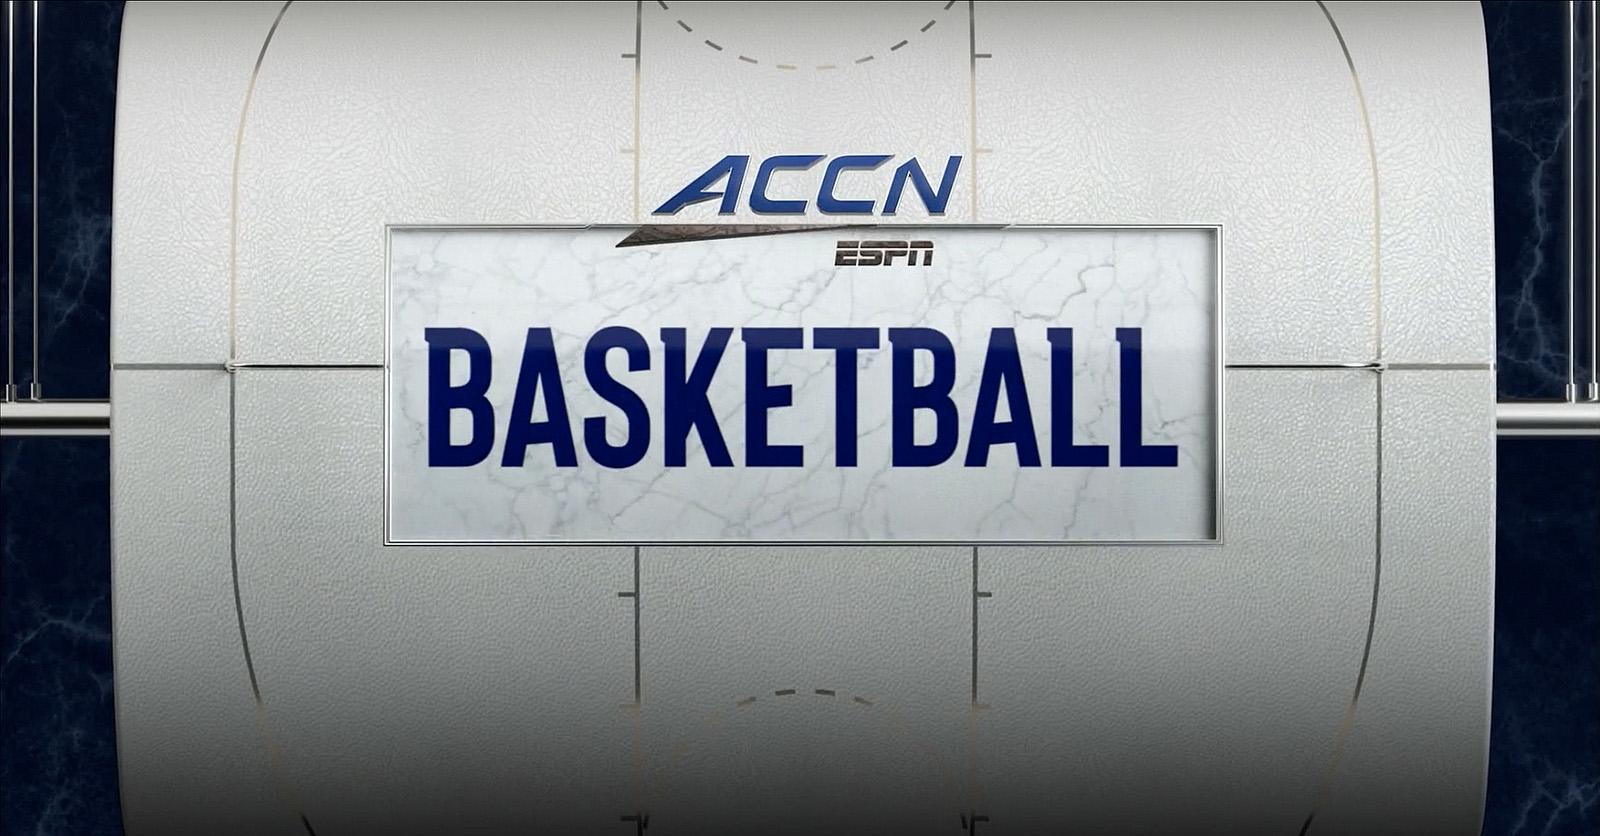 NCS_ACC-Network_Troika_ESPN_005